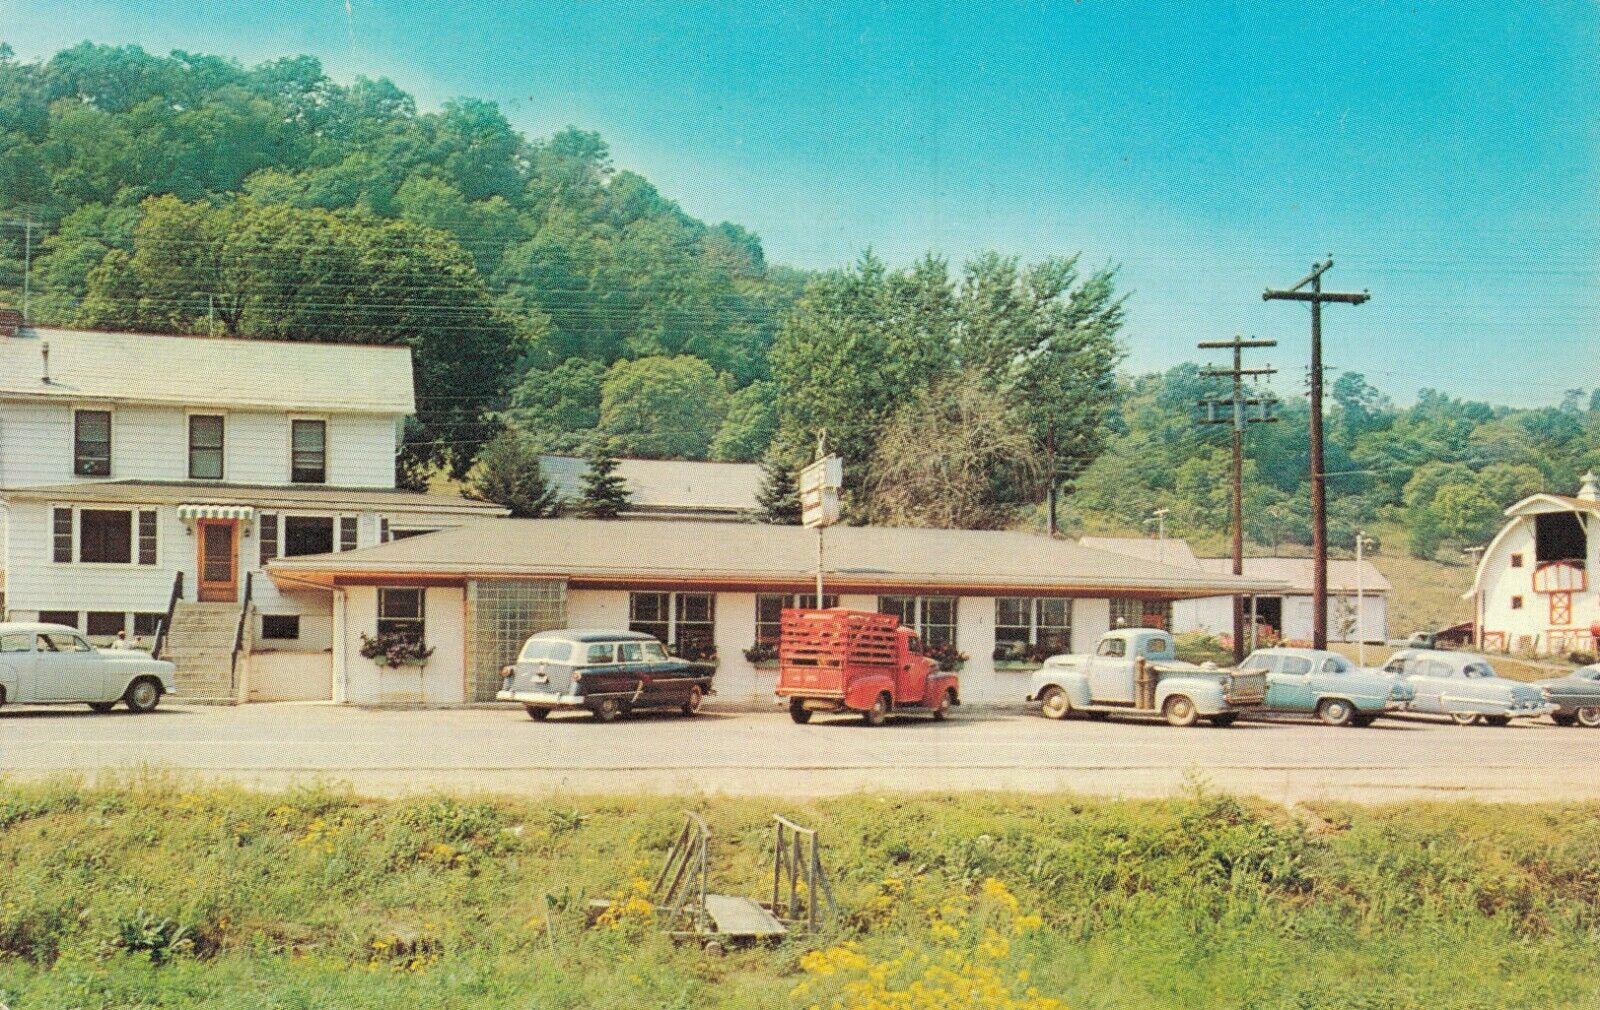 USA Ogles Restaurant Dexter City Ohio 04.29